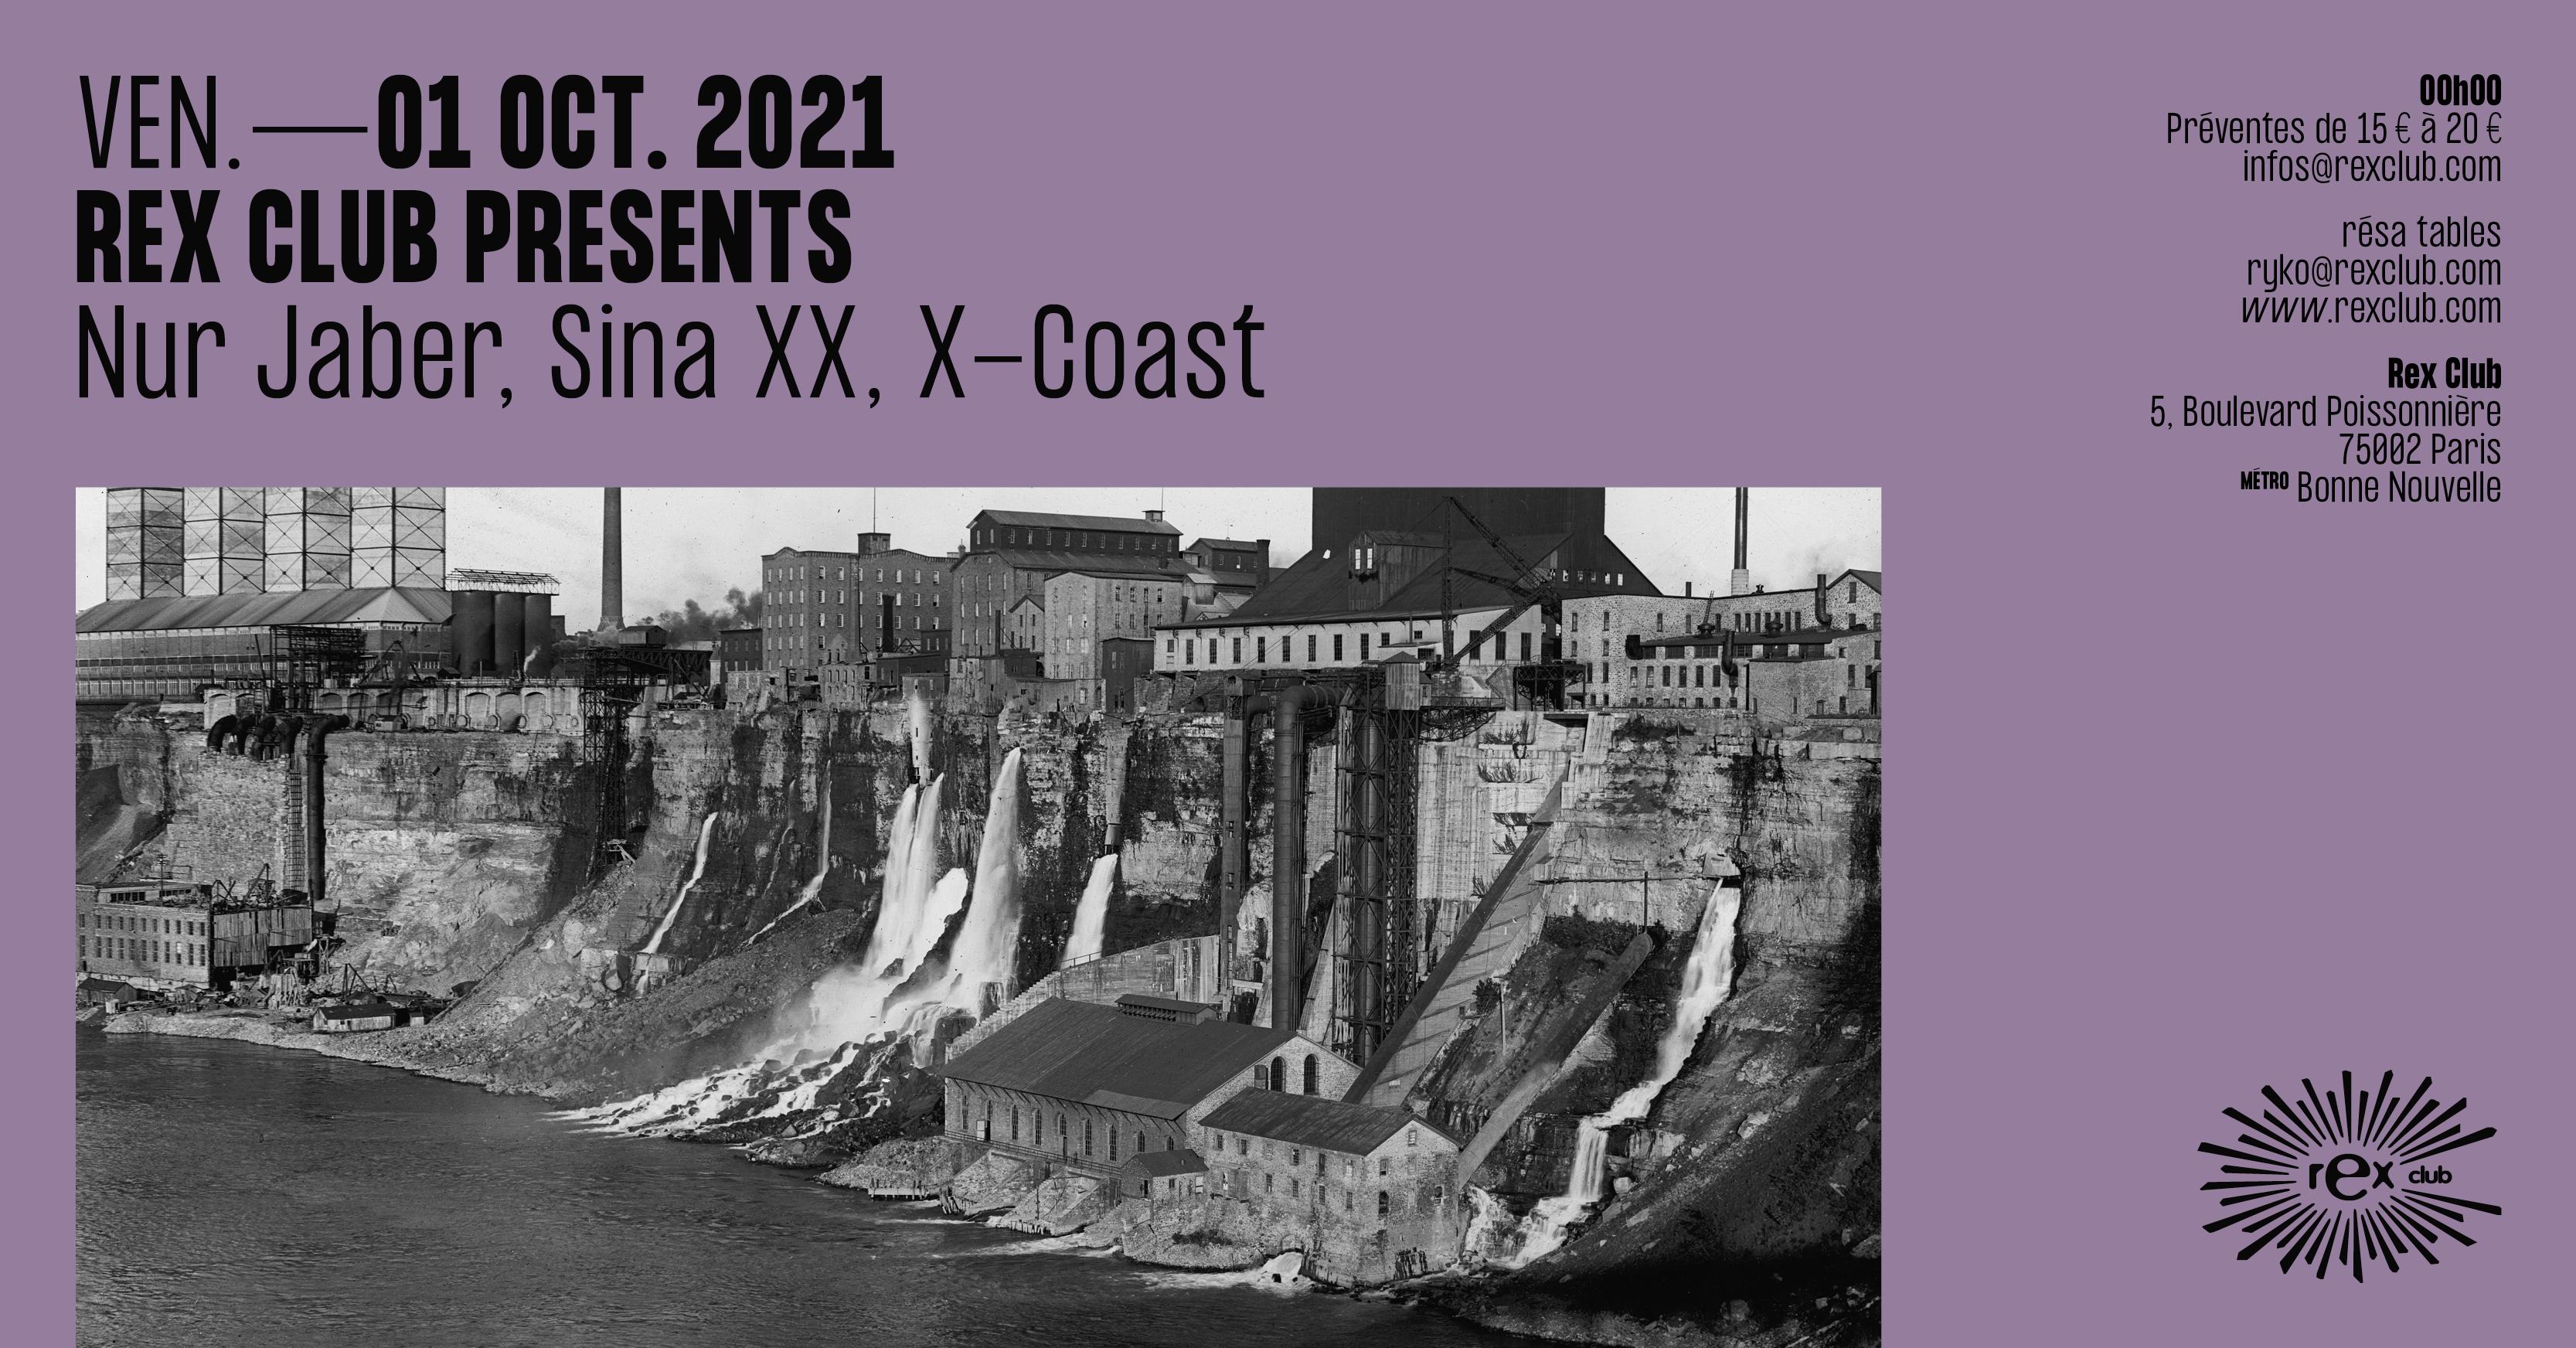 REX CLUB PRESENTS: Nur Jaber, Sina XX, X-Coast